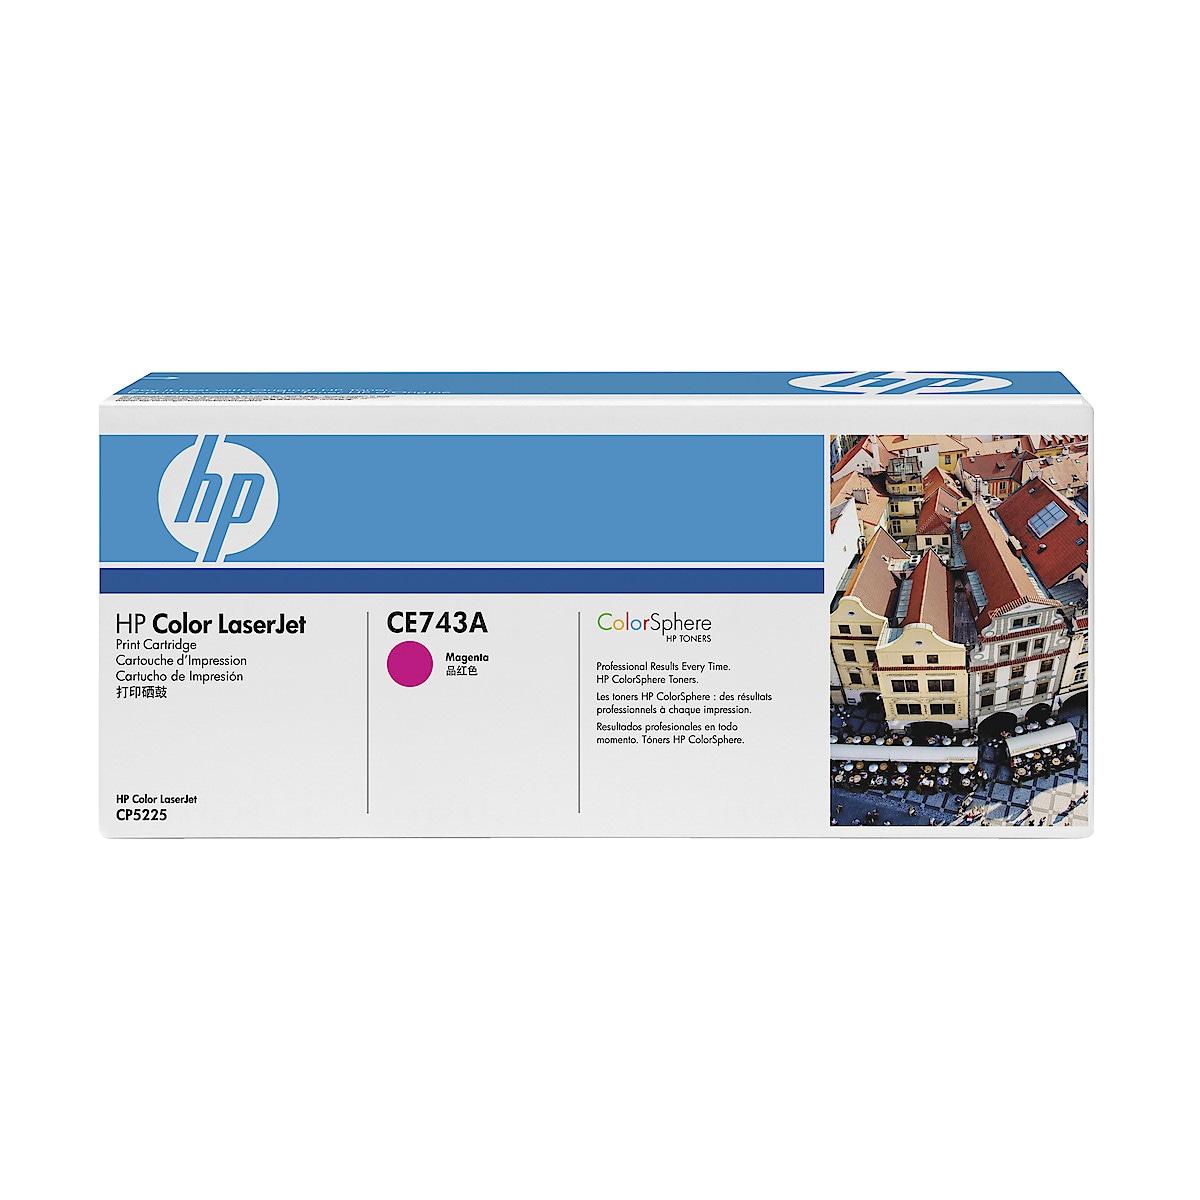 Toner for laserskrivere HP CE740A